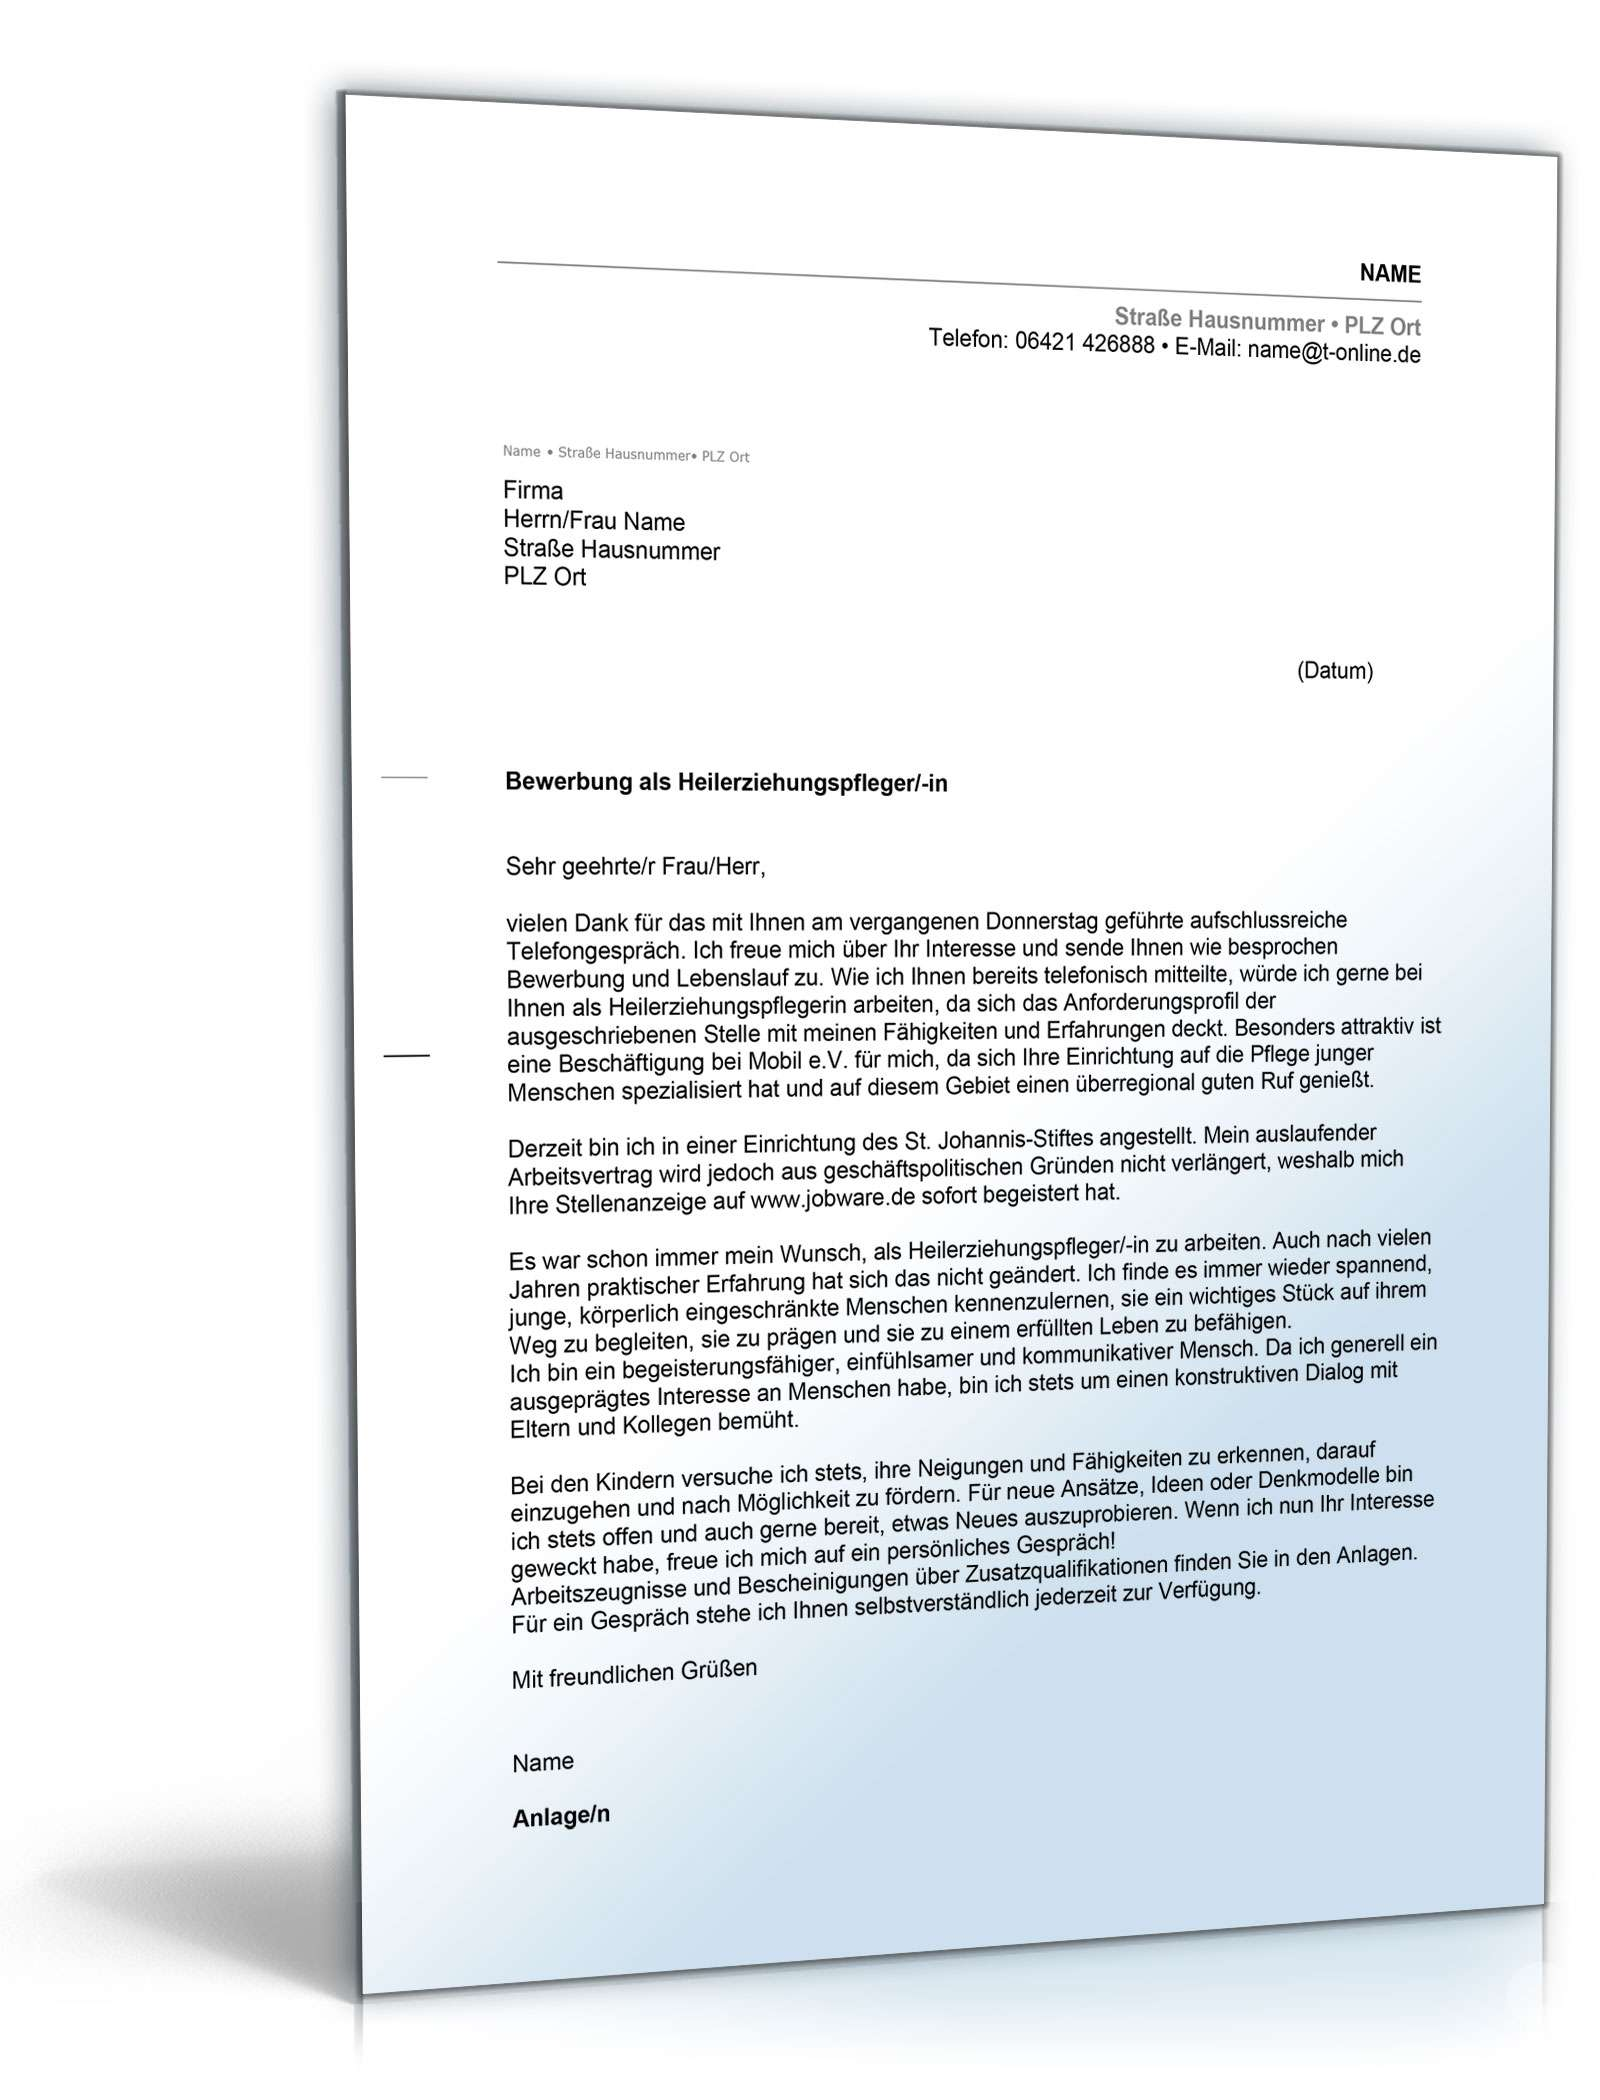 bewerbung ausbildung heilerziehungspfleger muster Anschreiben Bewerbung Heilerziehungspfleger | Muster zum Download